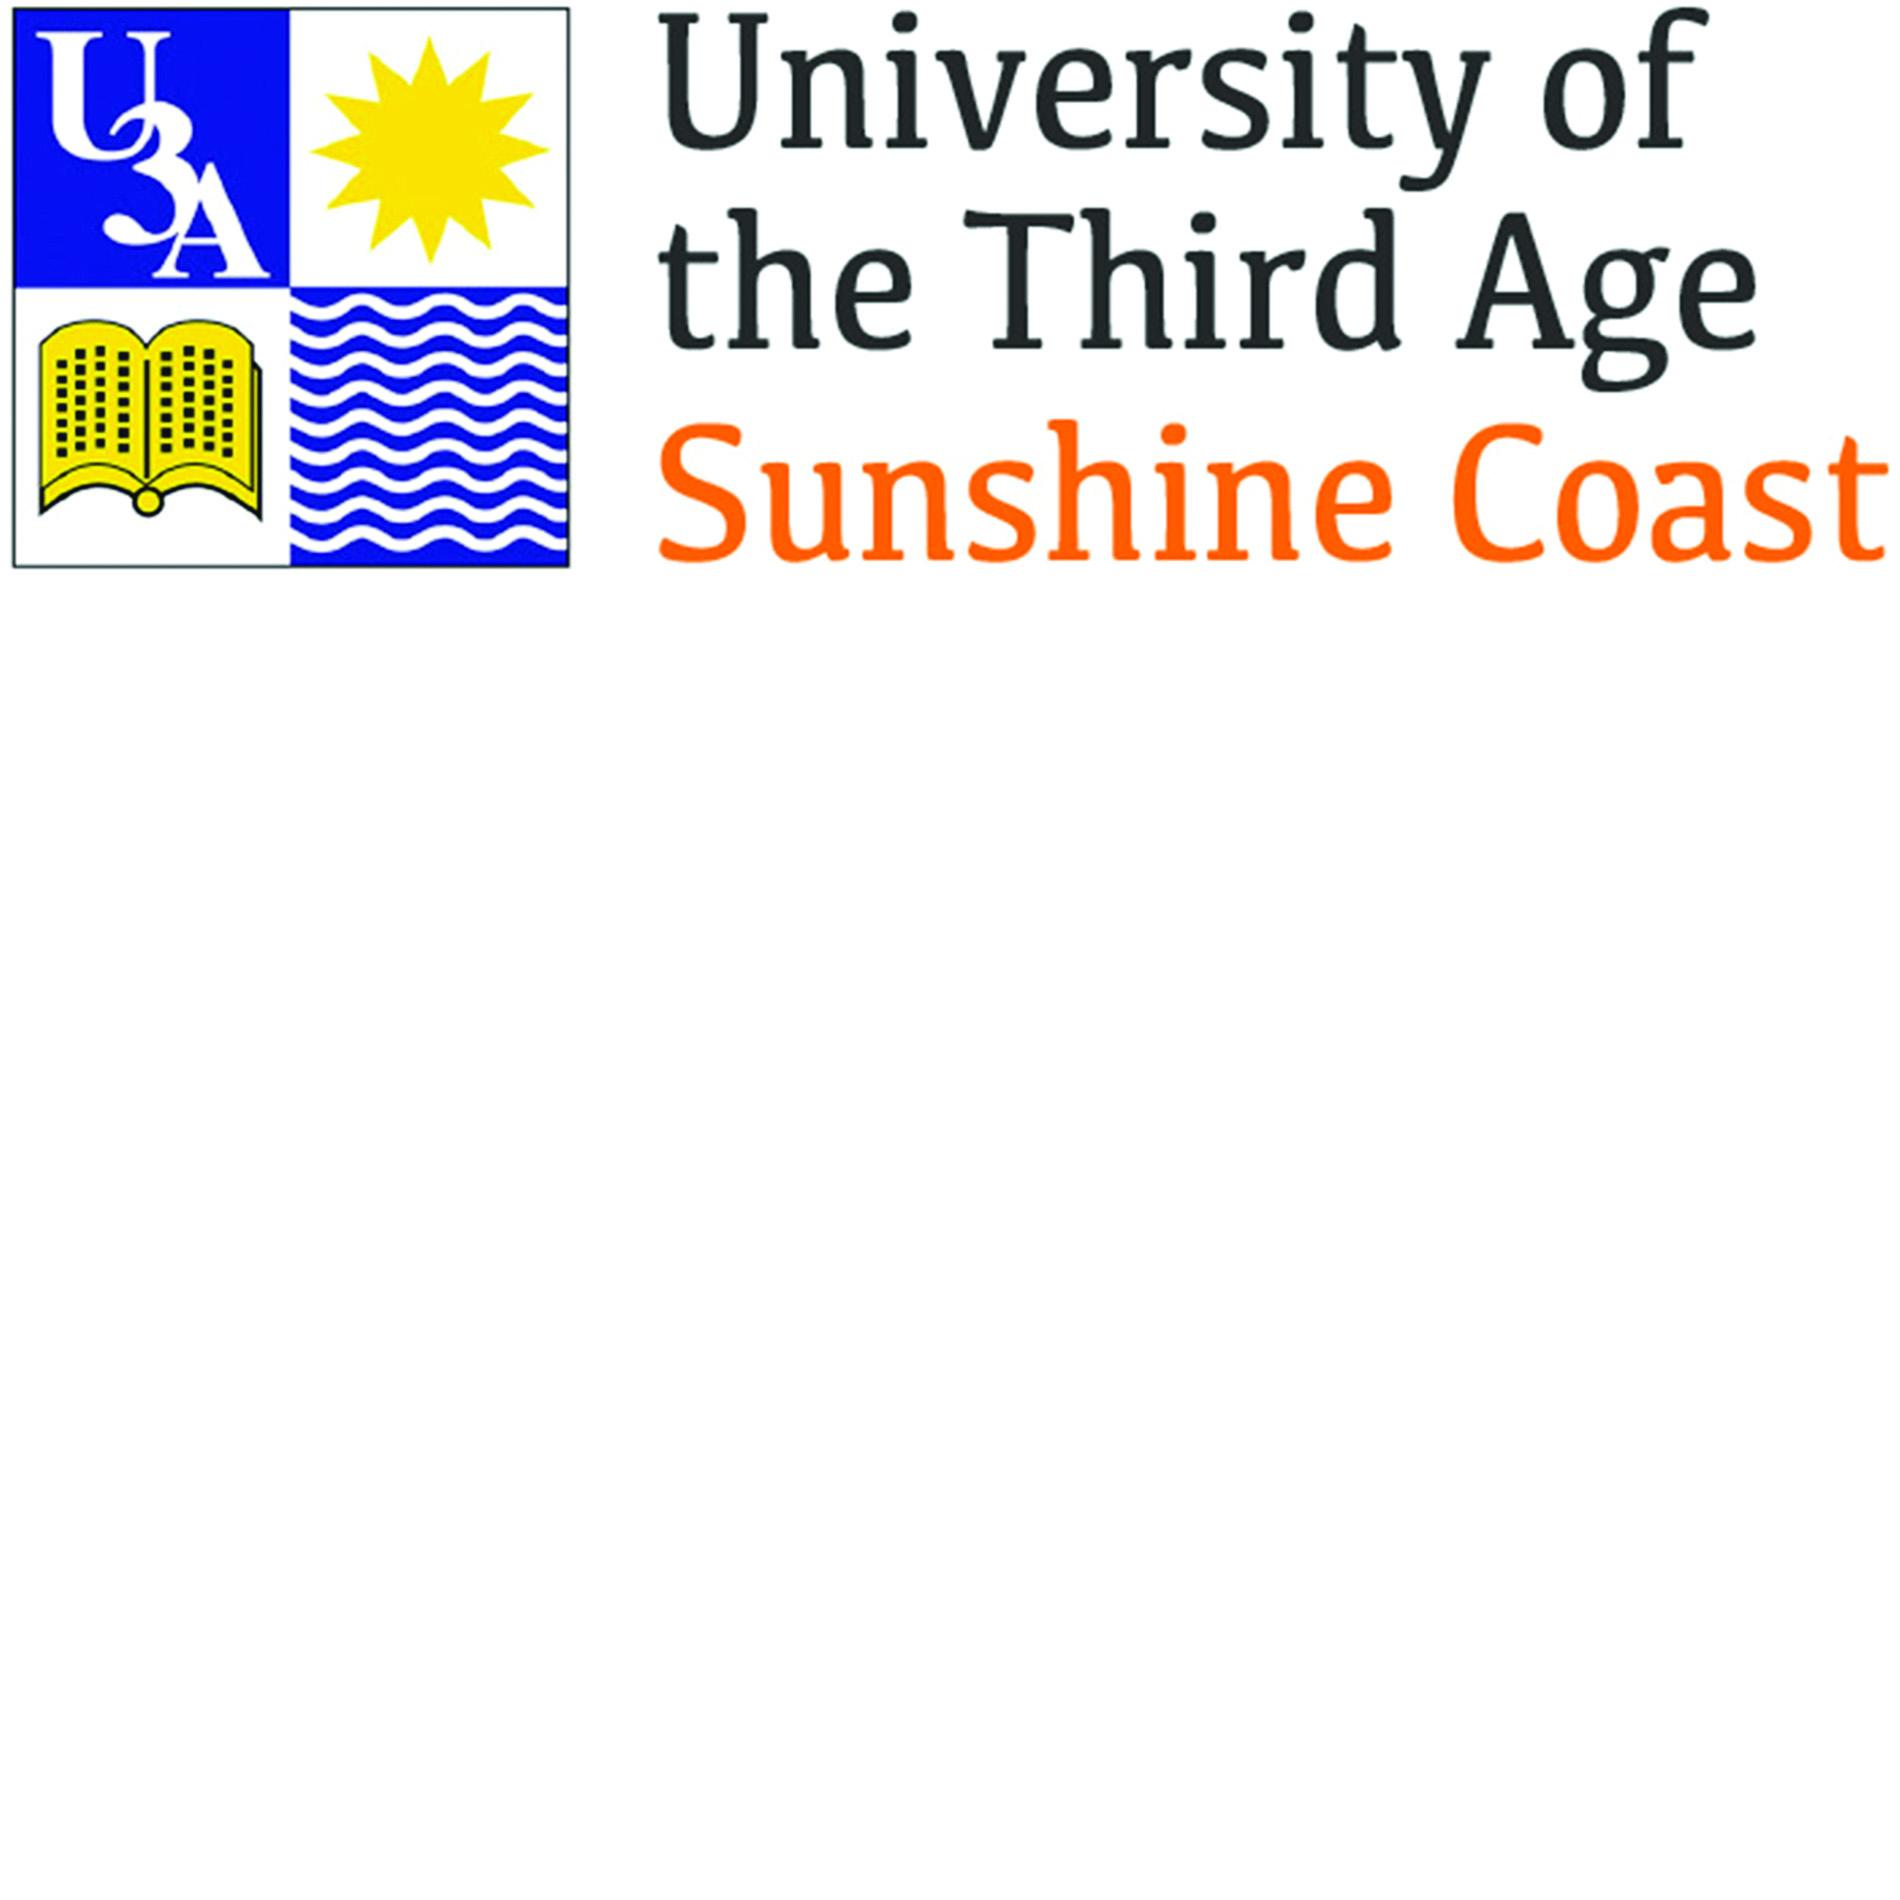 U3A (University of the Third Age)